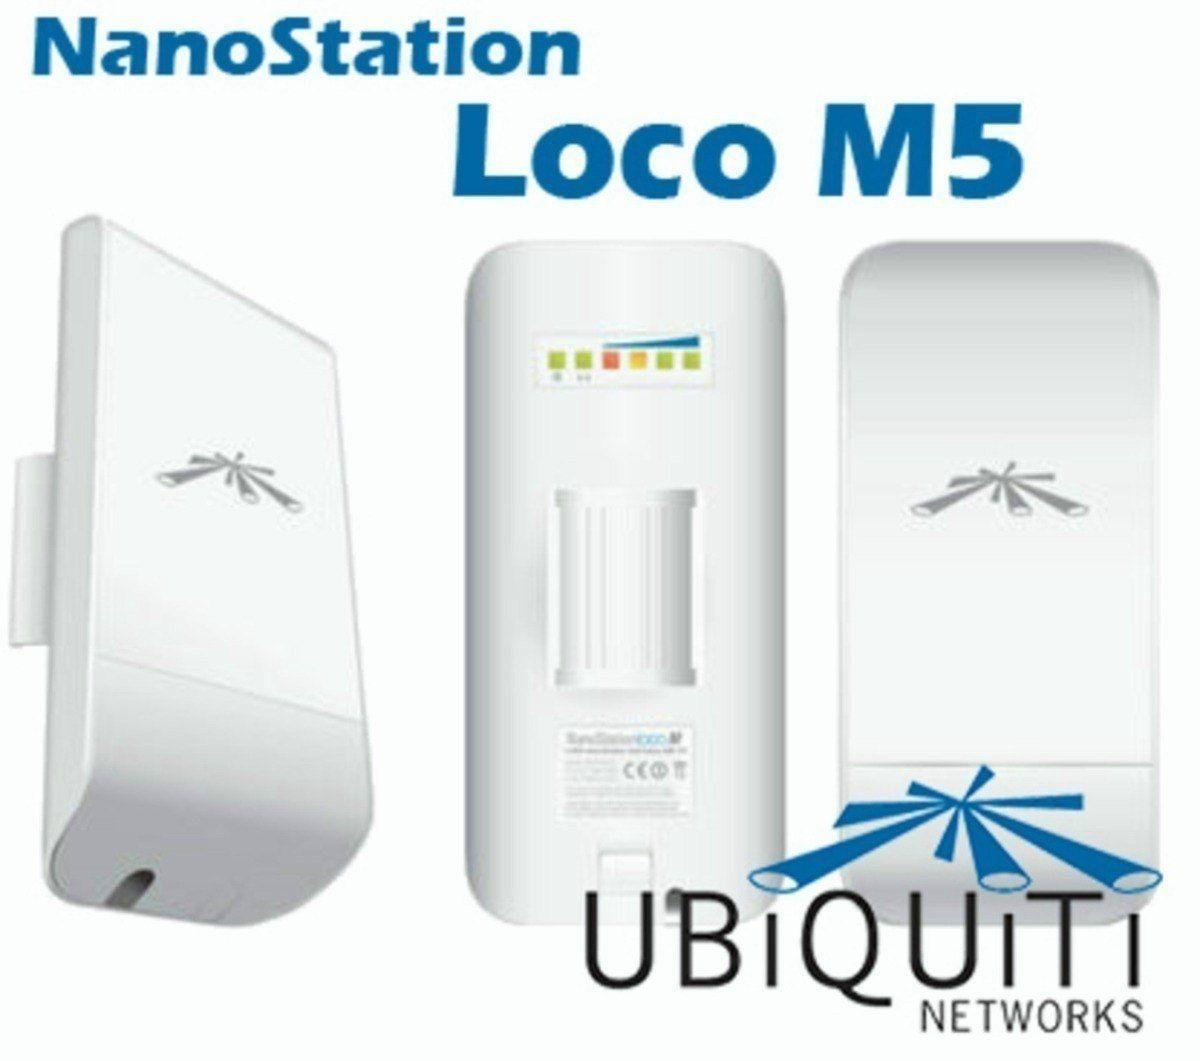 Access Point Ubiquiti Airmax Nanostation Locom5